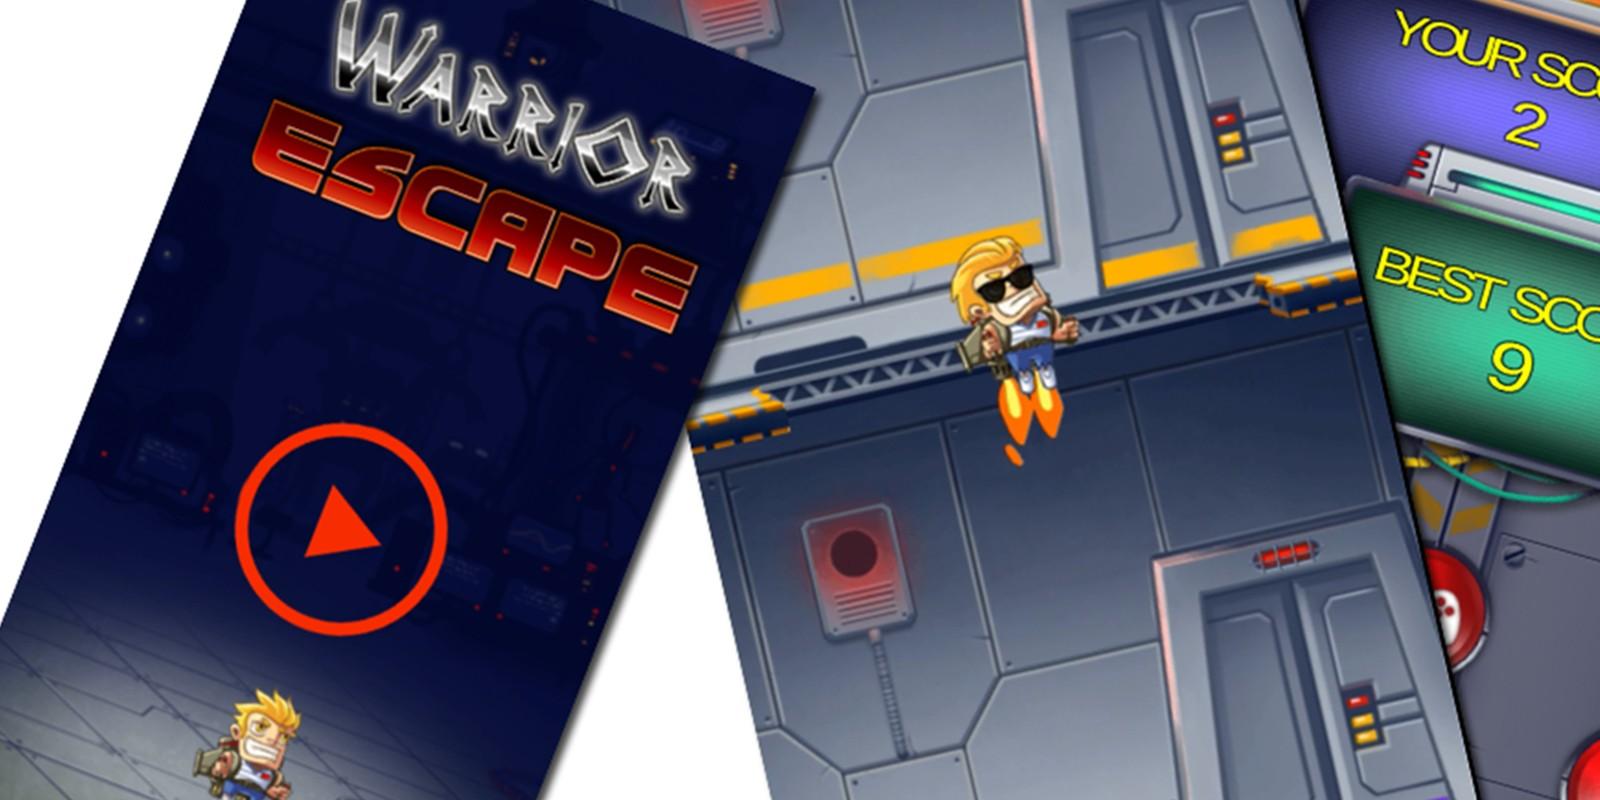 Warrior Escape Unity Complete Project